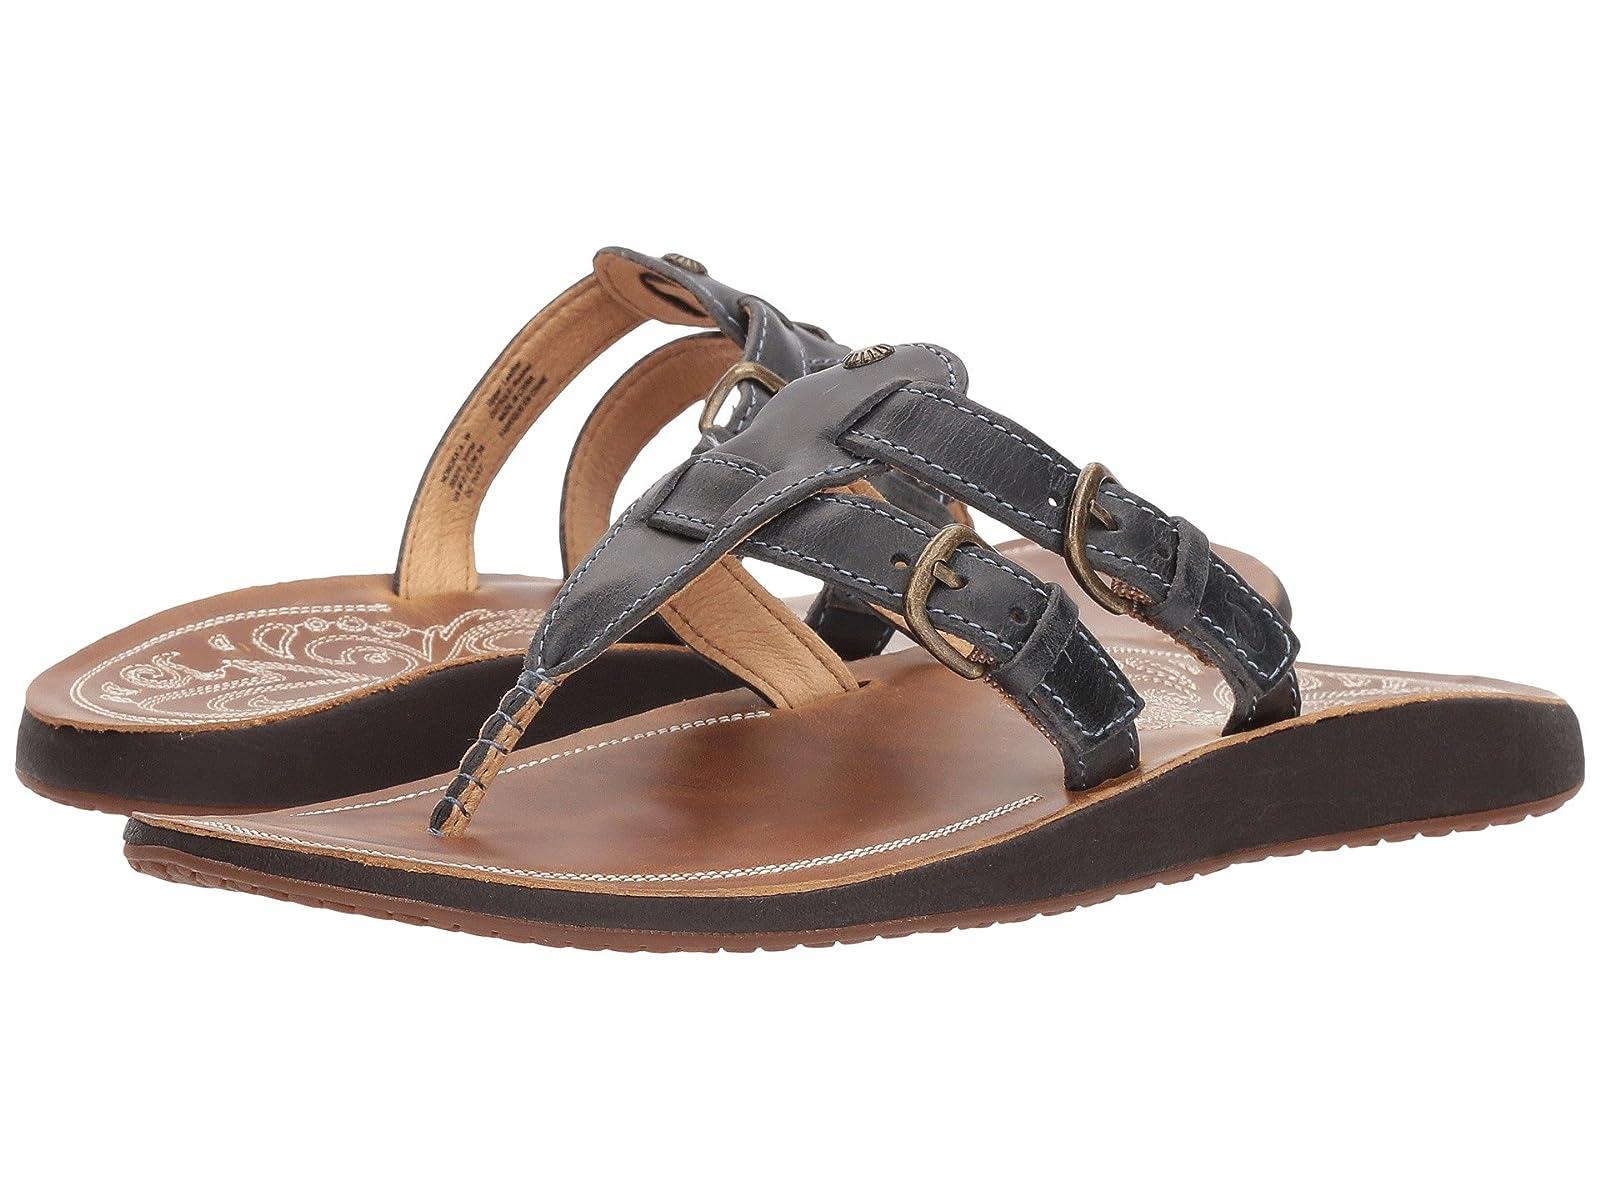 OluKai Honoka'aAtmospheric grades have affordable shoes